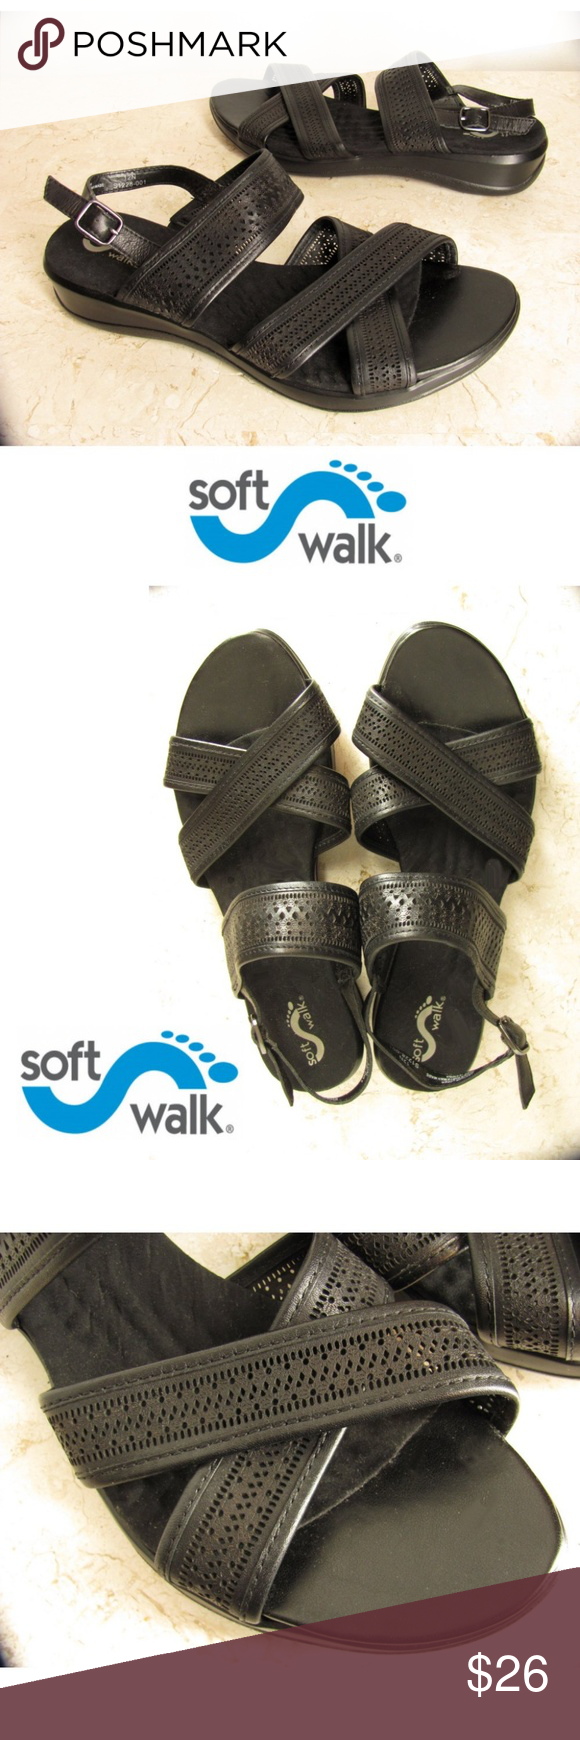 3315415b01aa Hot Topic Demonia Platform Sandal 8M Skulls New Hot Topic Demonia Platform  Sandal Shoes 8 M Skulls on Black Hot Topic Demonia super…